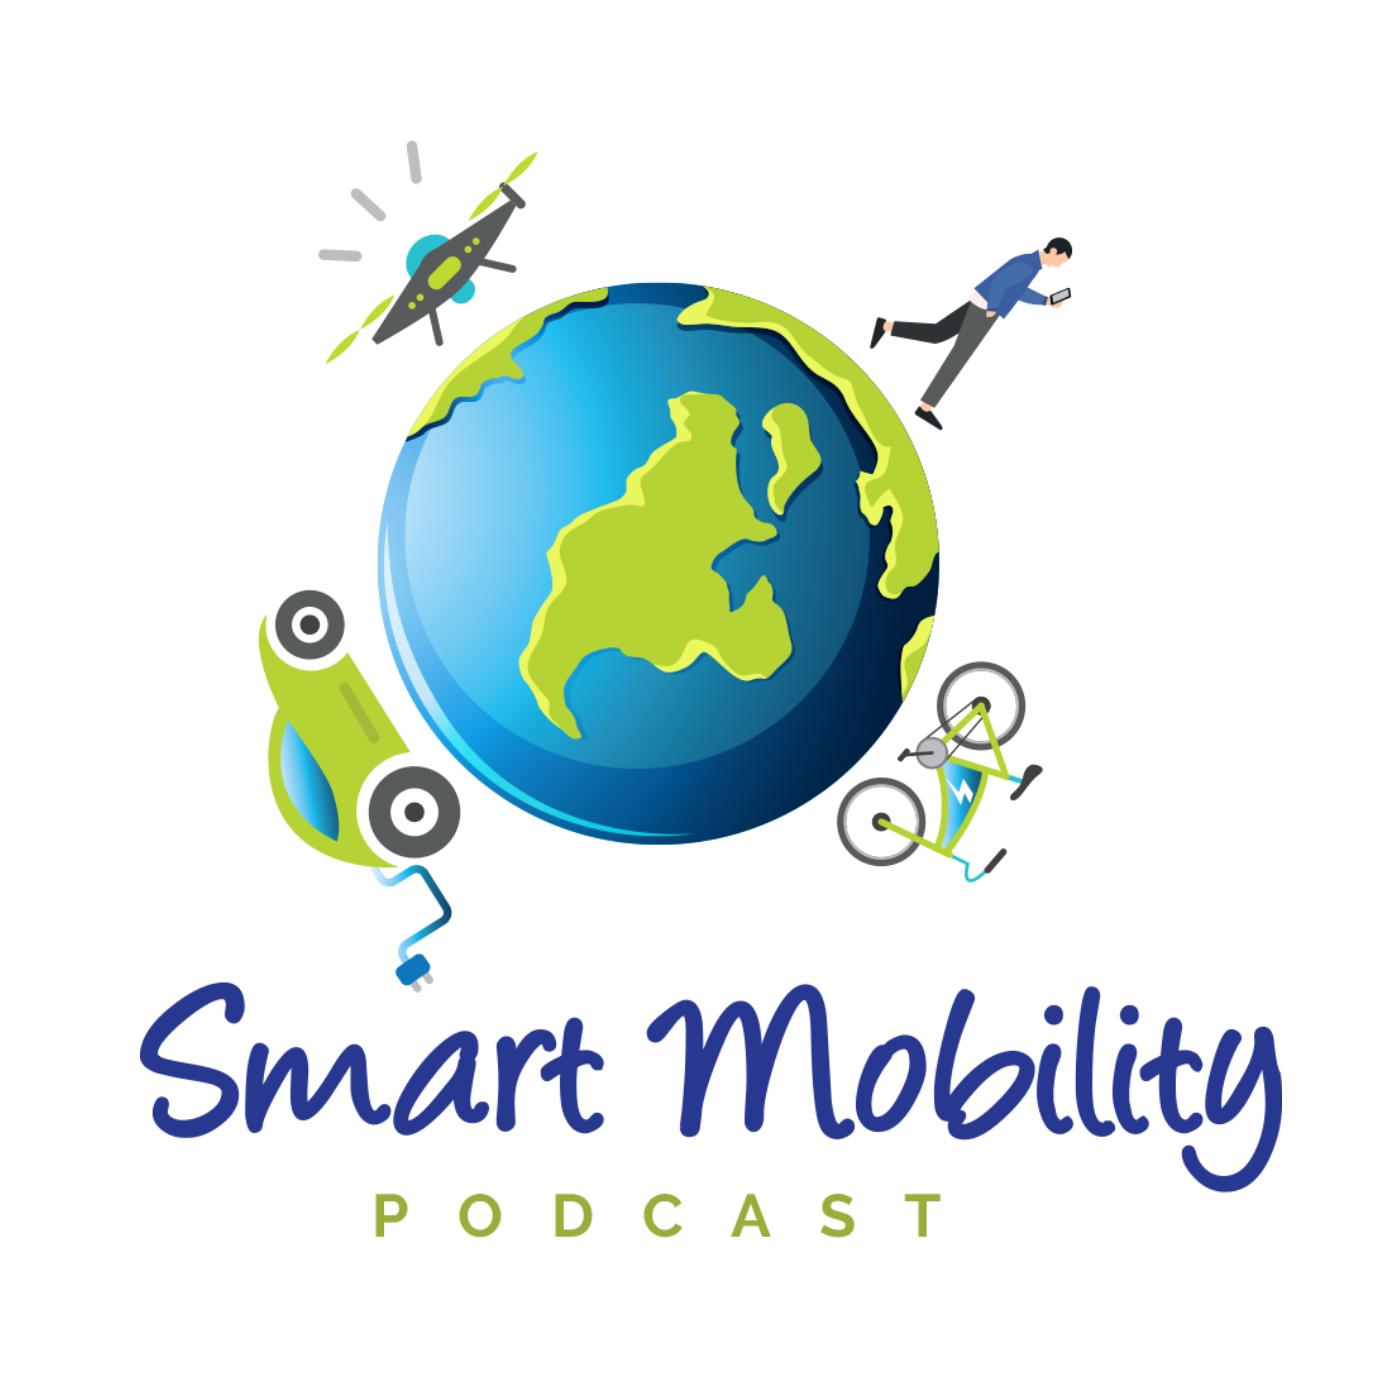 Smart Mobility Podcast show art